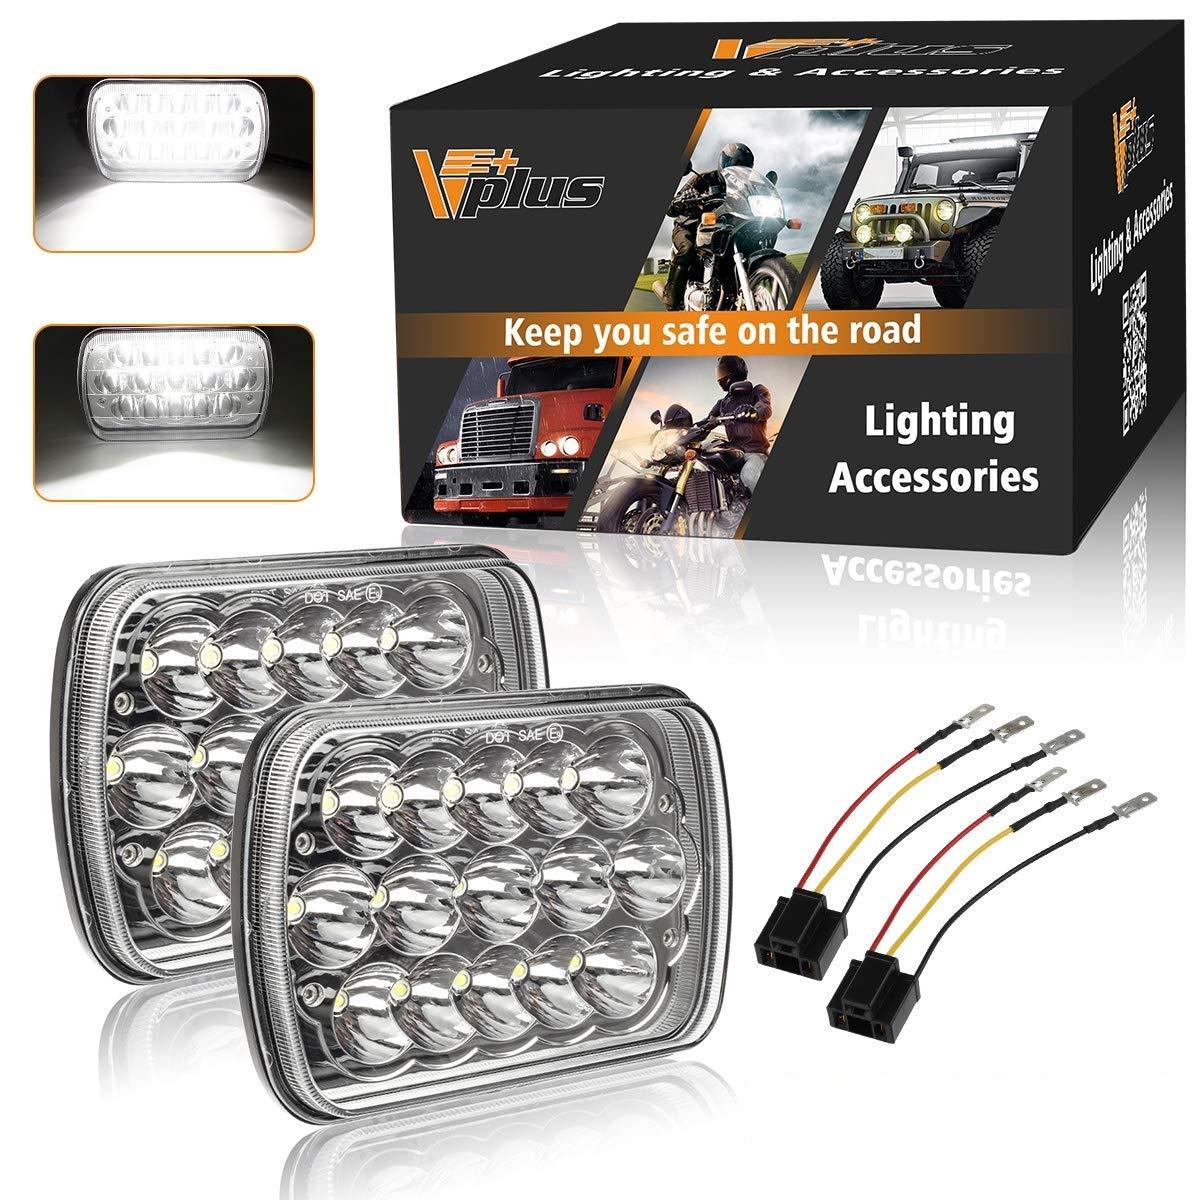 Partsam H6054 7x6 5x7 LED Headlights Sealed Beam Hi/Low w/ H4 Wiring on